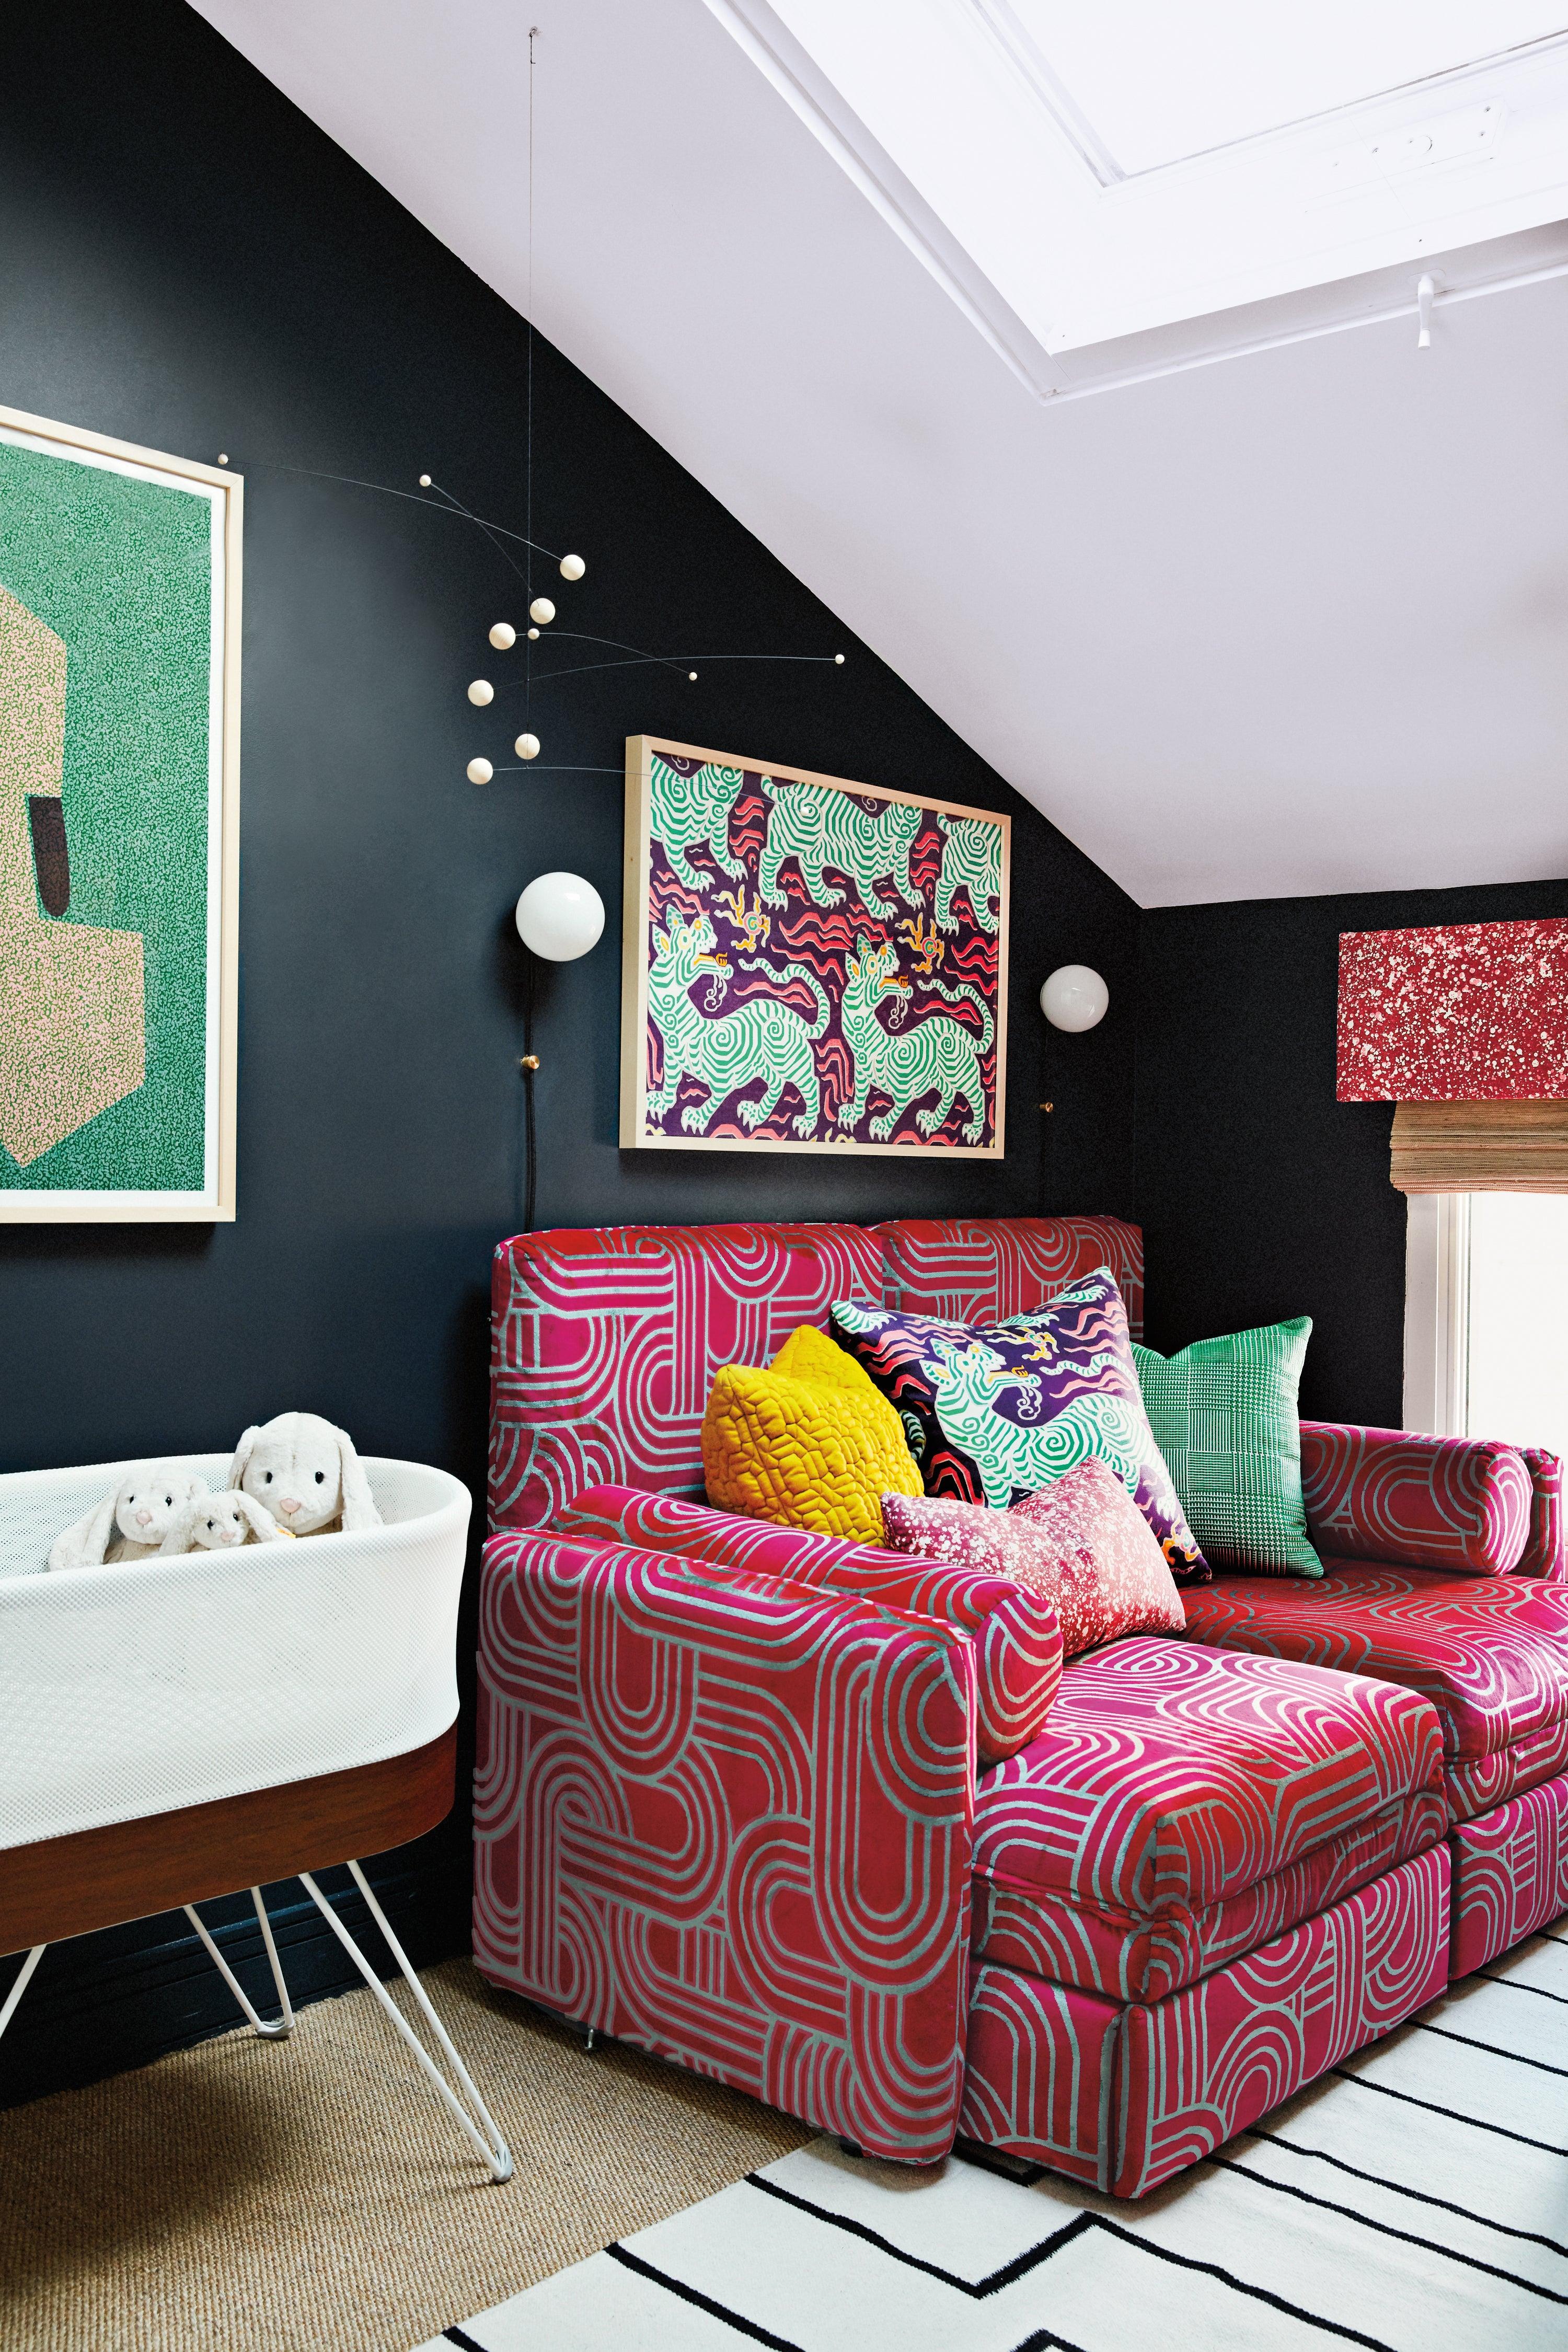 christene-barberich-ikea-pink-sofa